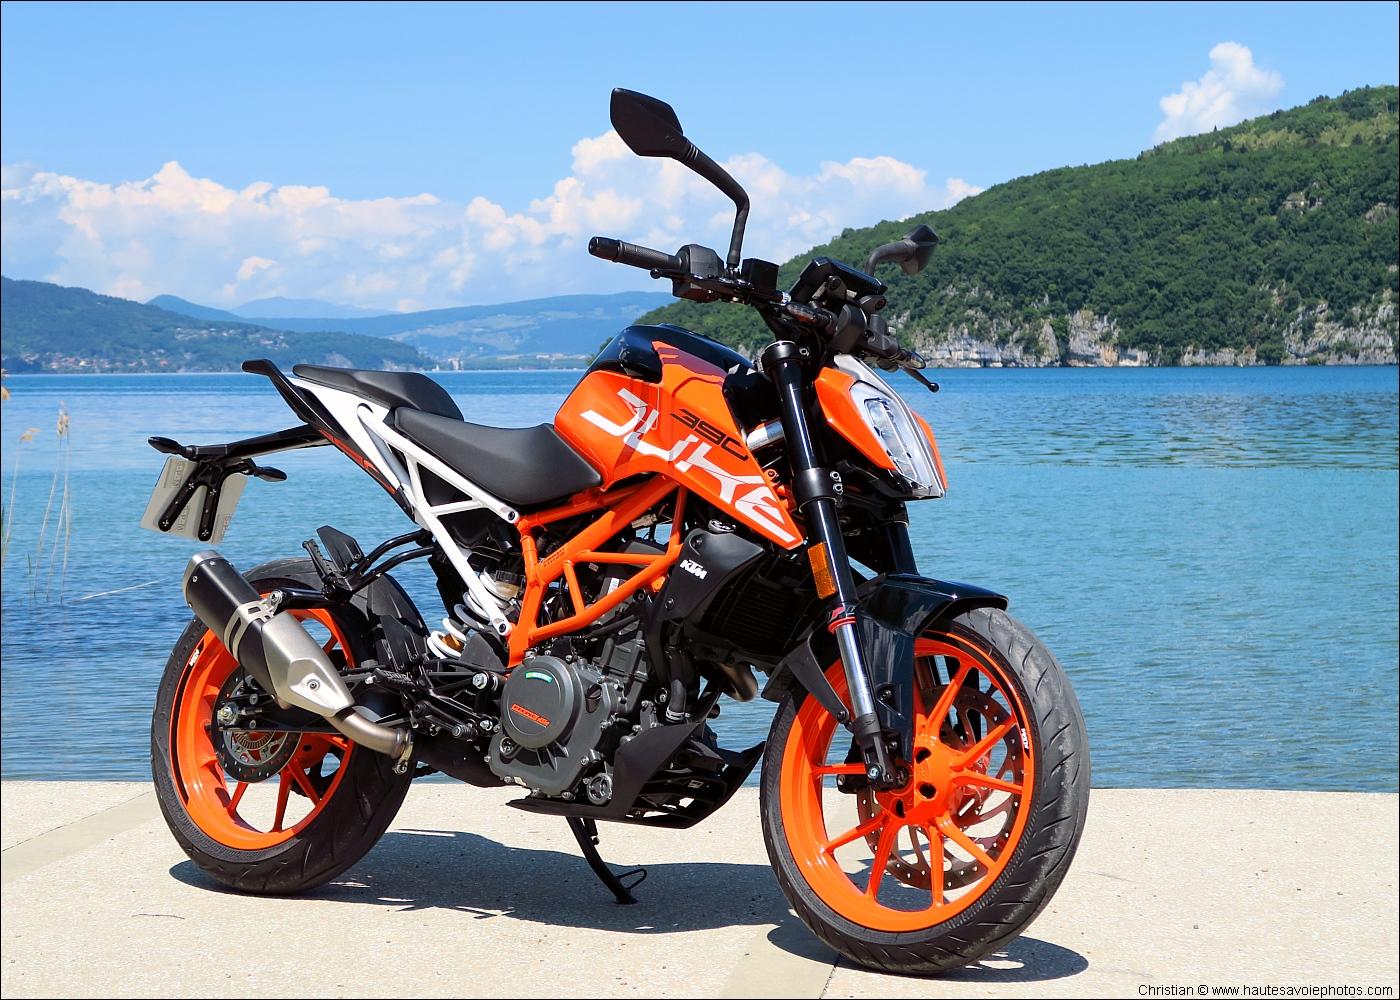 2 fonds d'écran en 1400x1000 : moto roadster KTM 390 Duke / Wallpaper